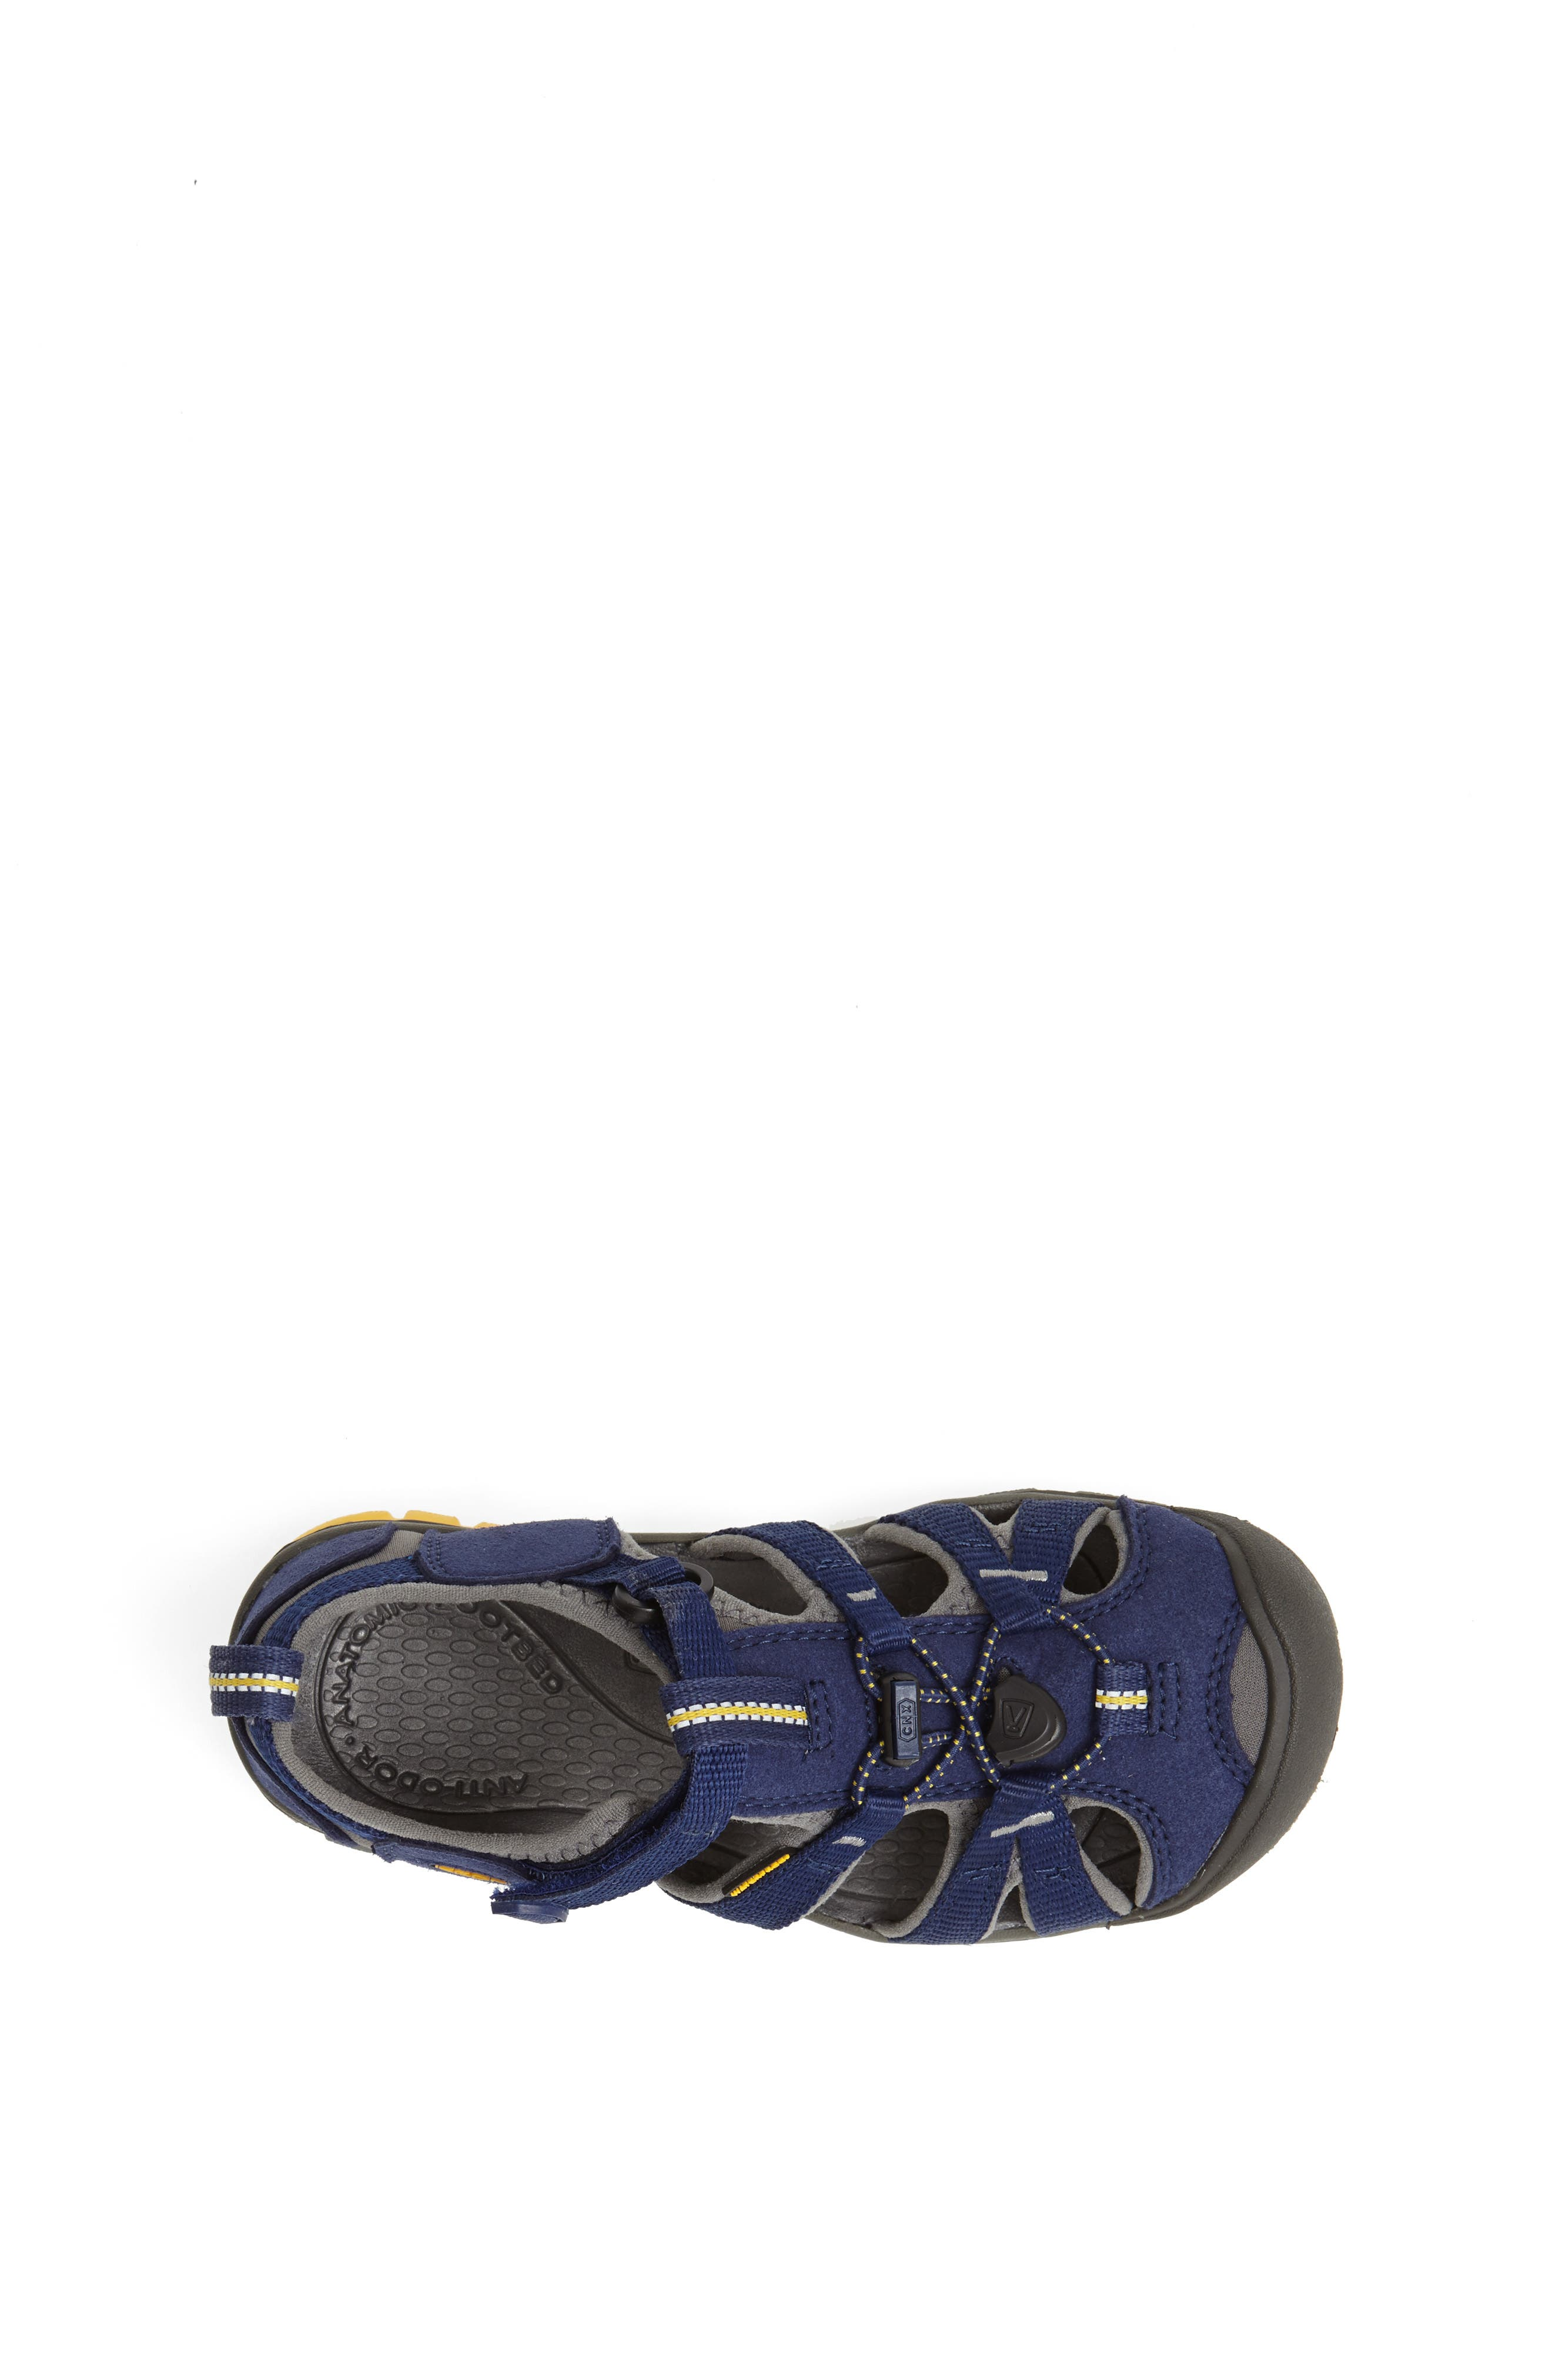 ,                             'Seacamp II' Water Friendly Sandal,                             Alternate thumbnail 209, color,                             477